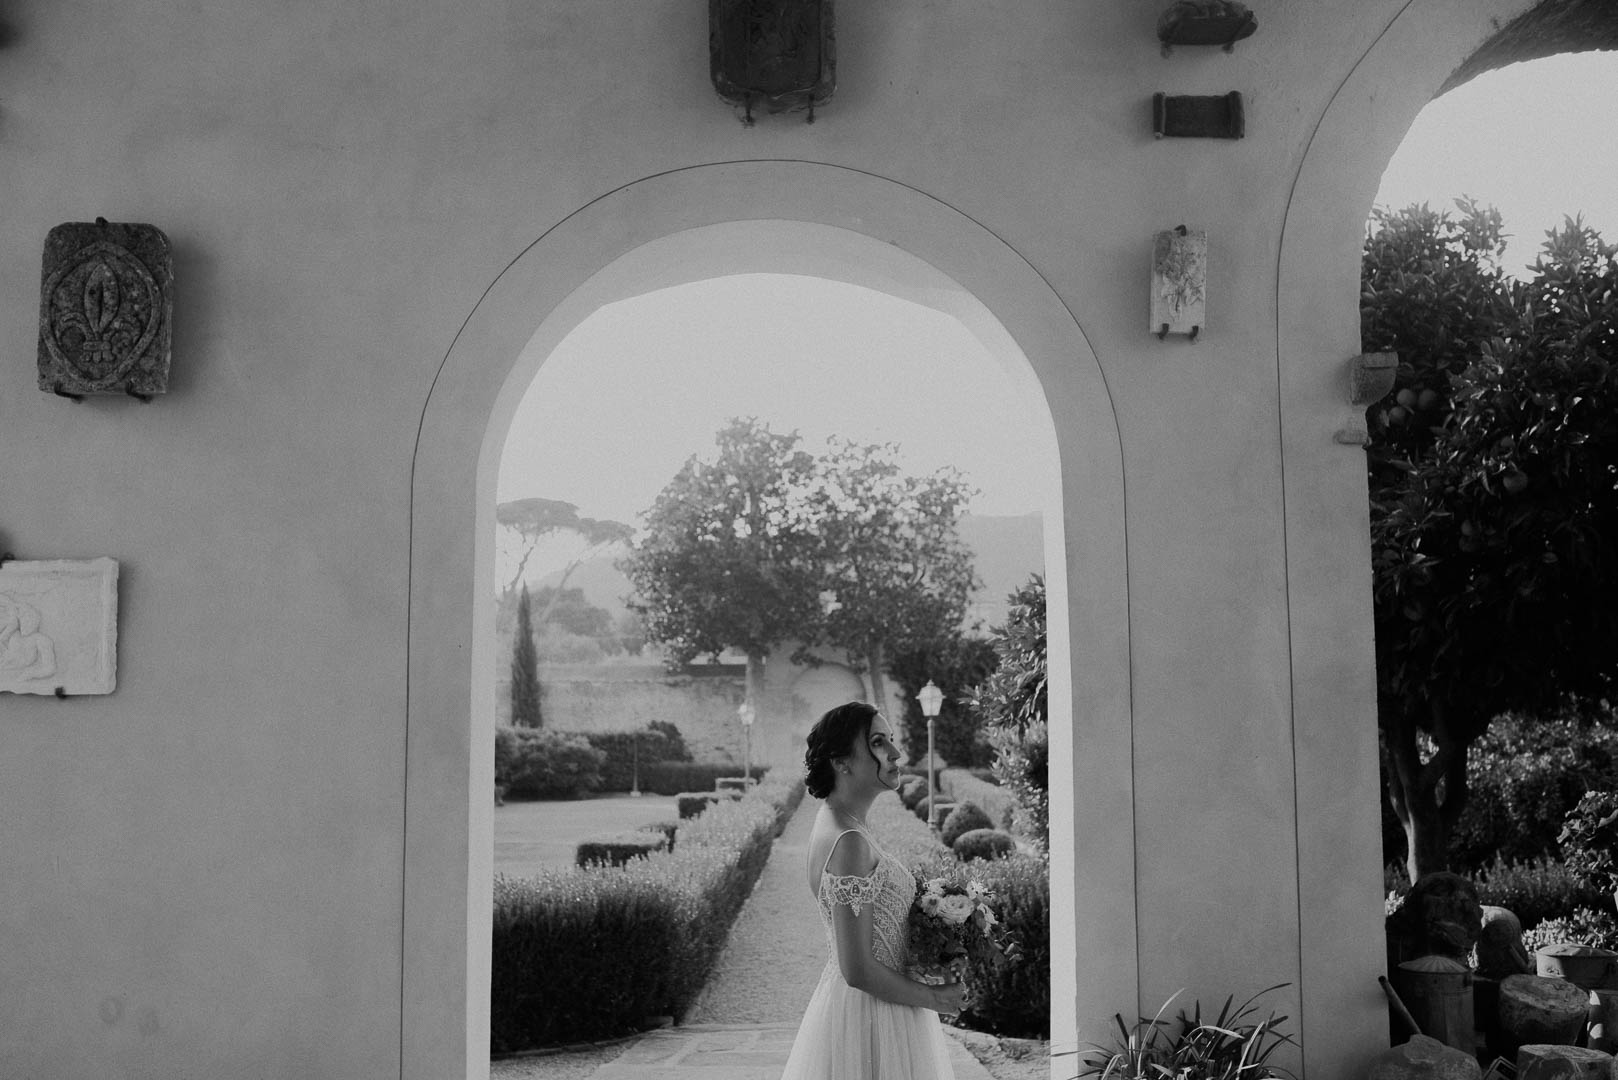 wedding-photographer-destination-fineart-bespoke-reportage-tuscany-villascorzi-vivianeizzo-spazio46-101